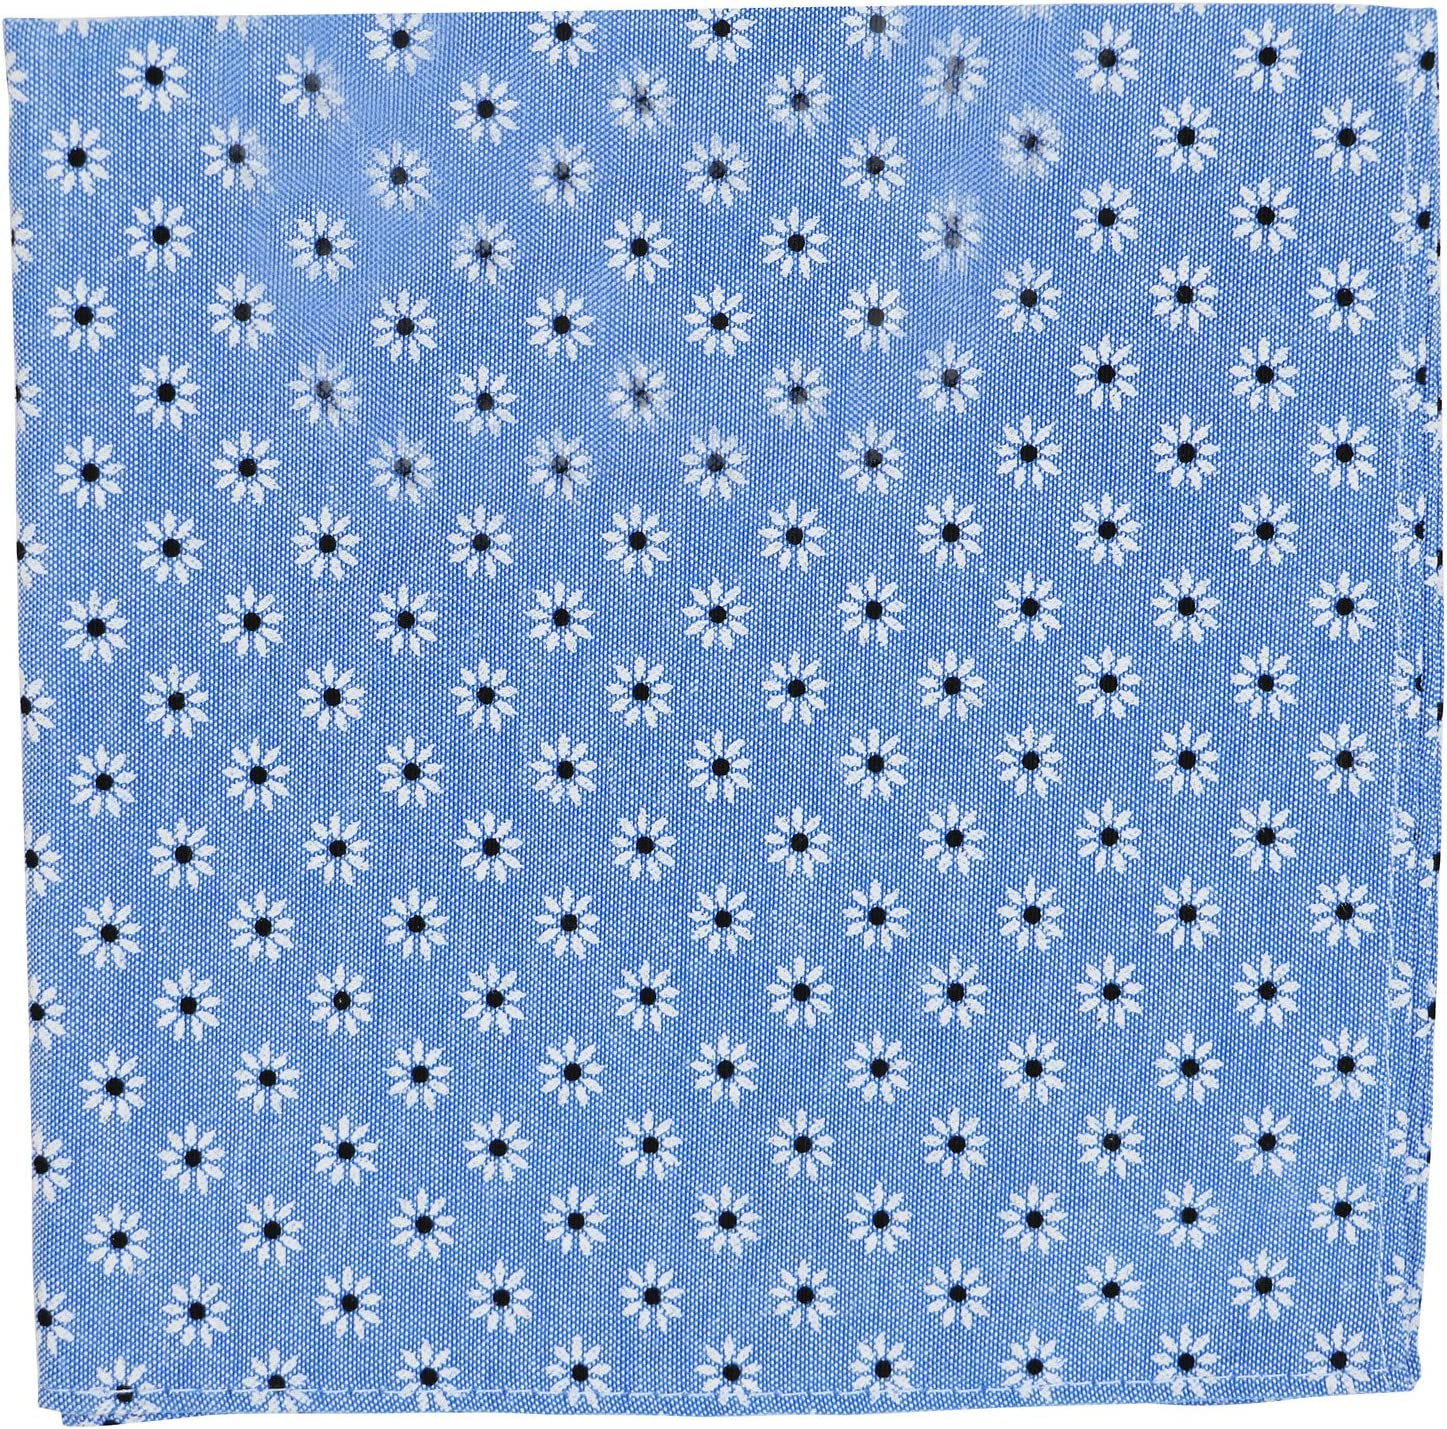 Tommy Hilfiger Oxford Daisy Pocket Square (One Size, Blue)